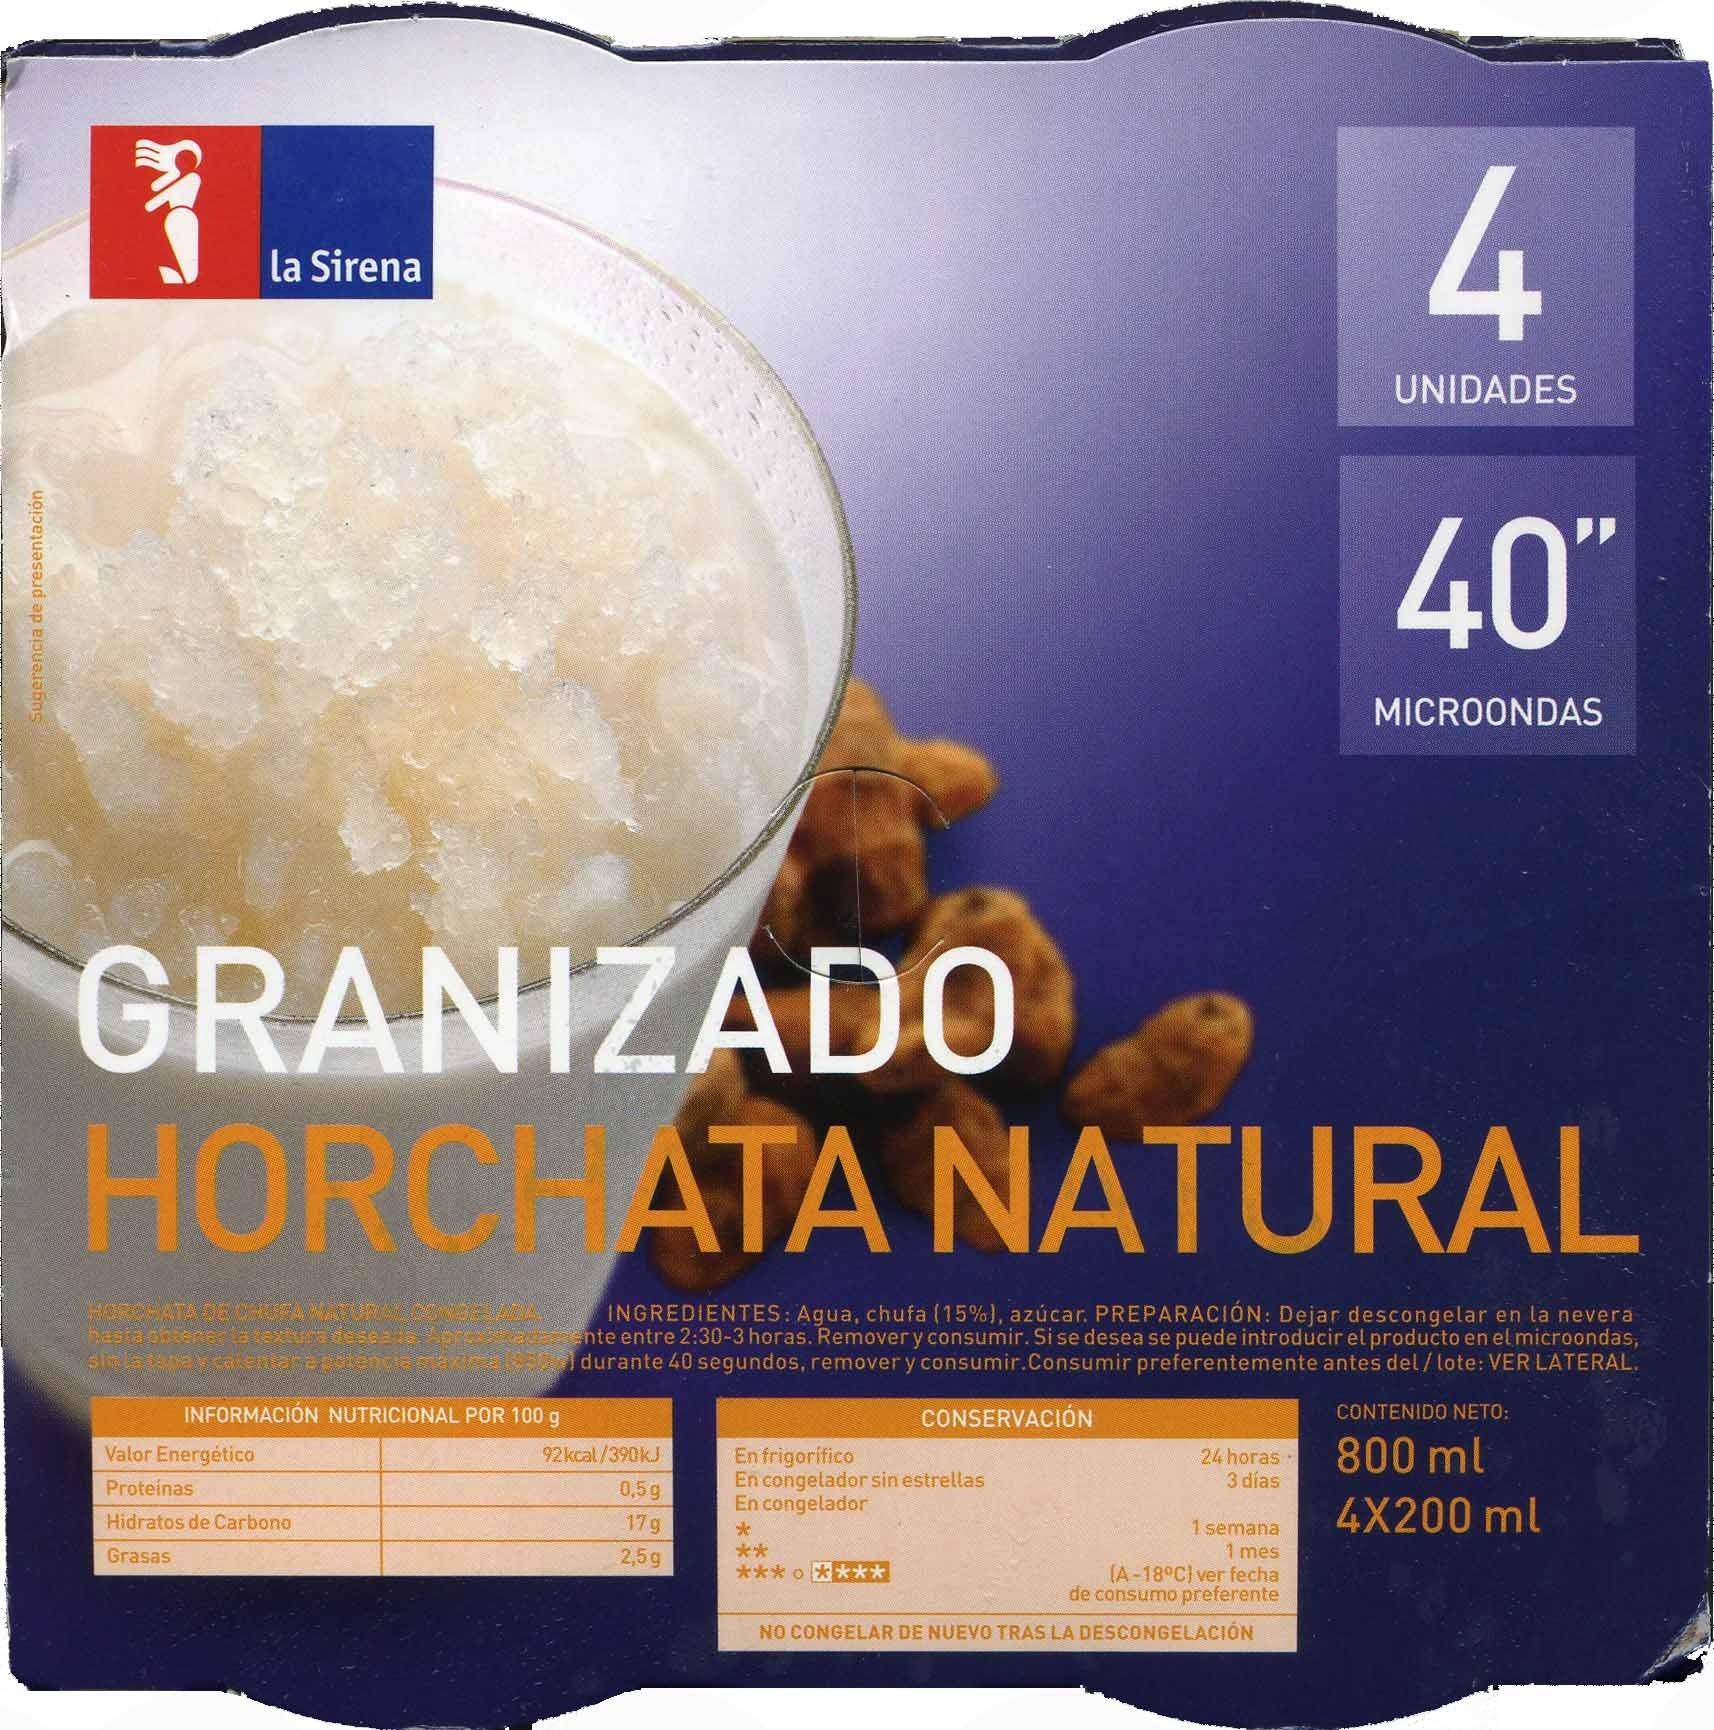 Granizado horchata natural - Product - es